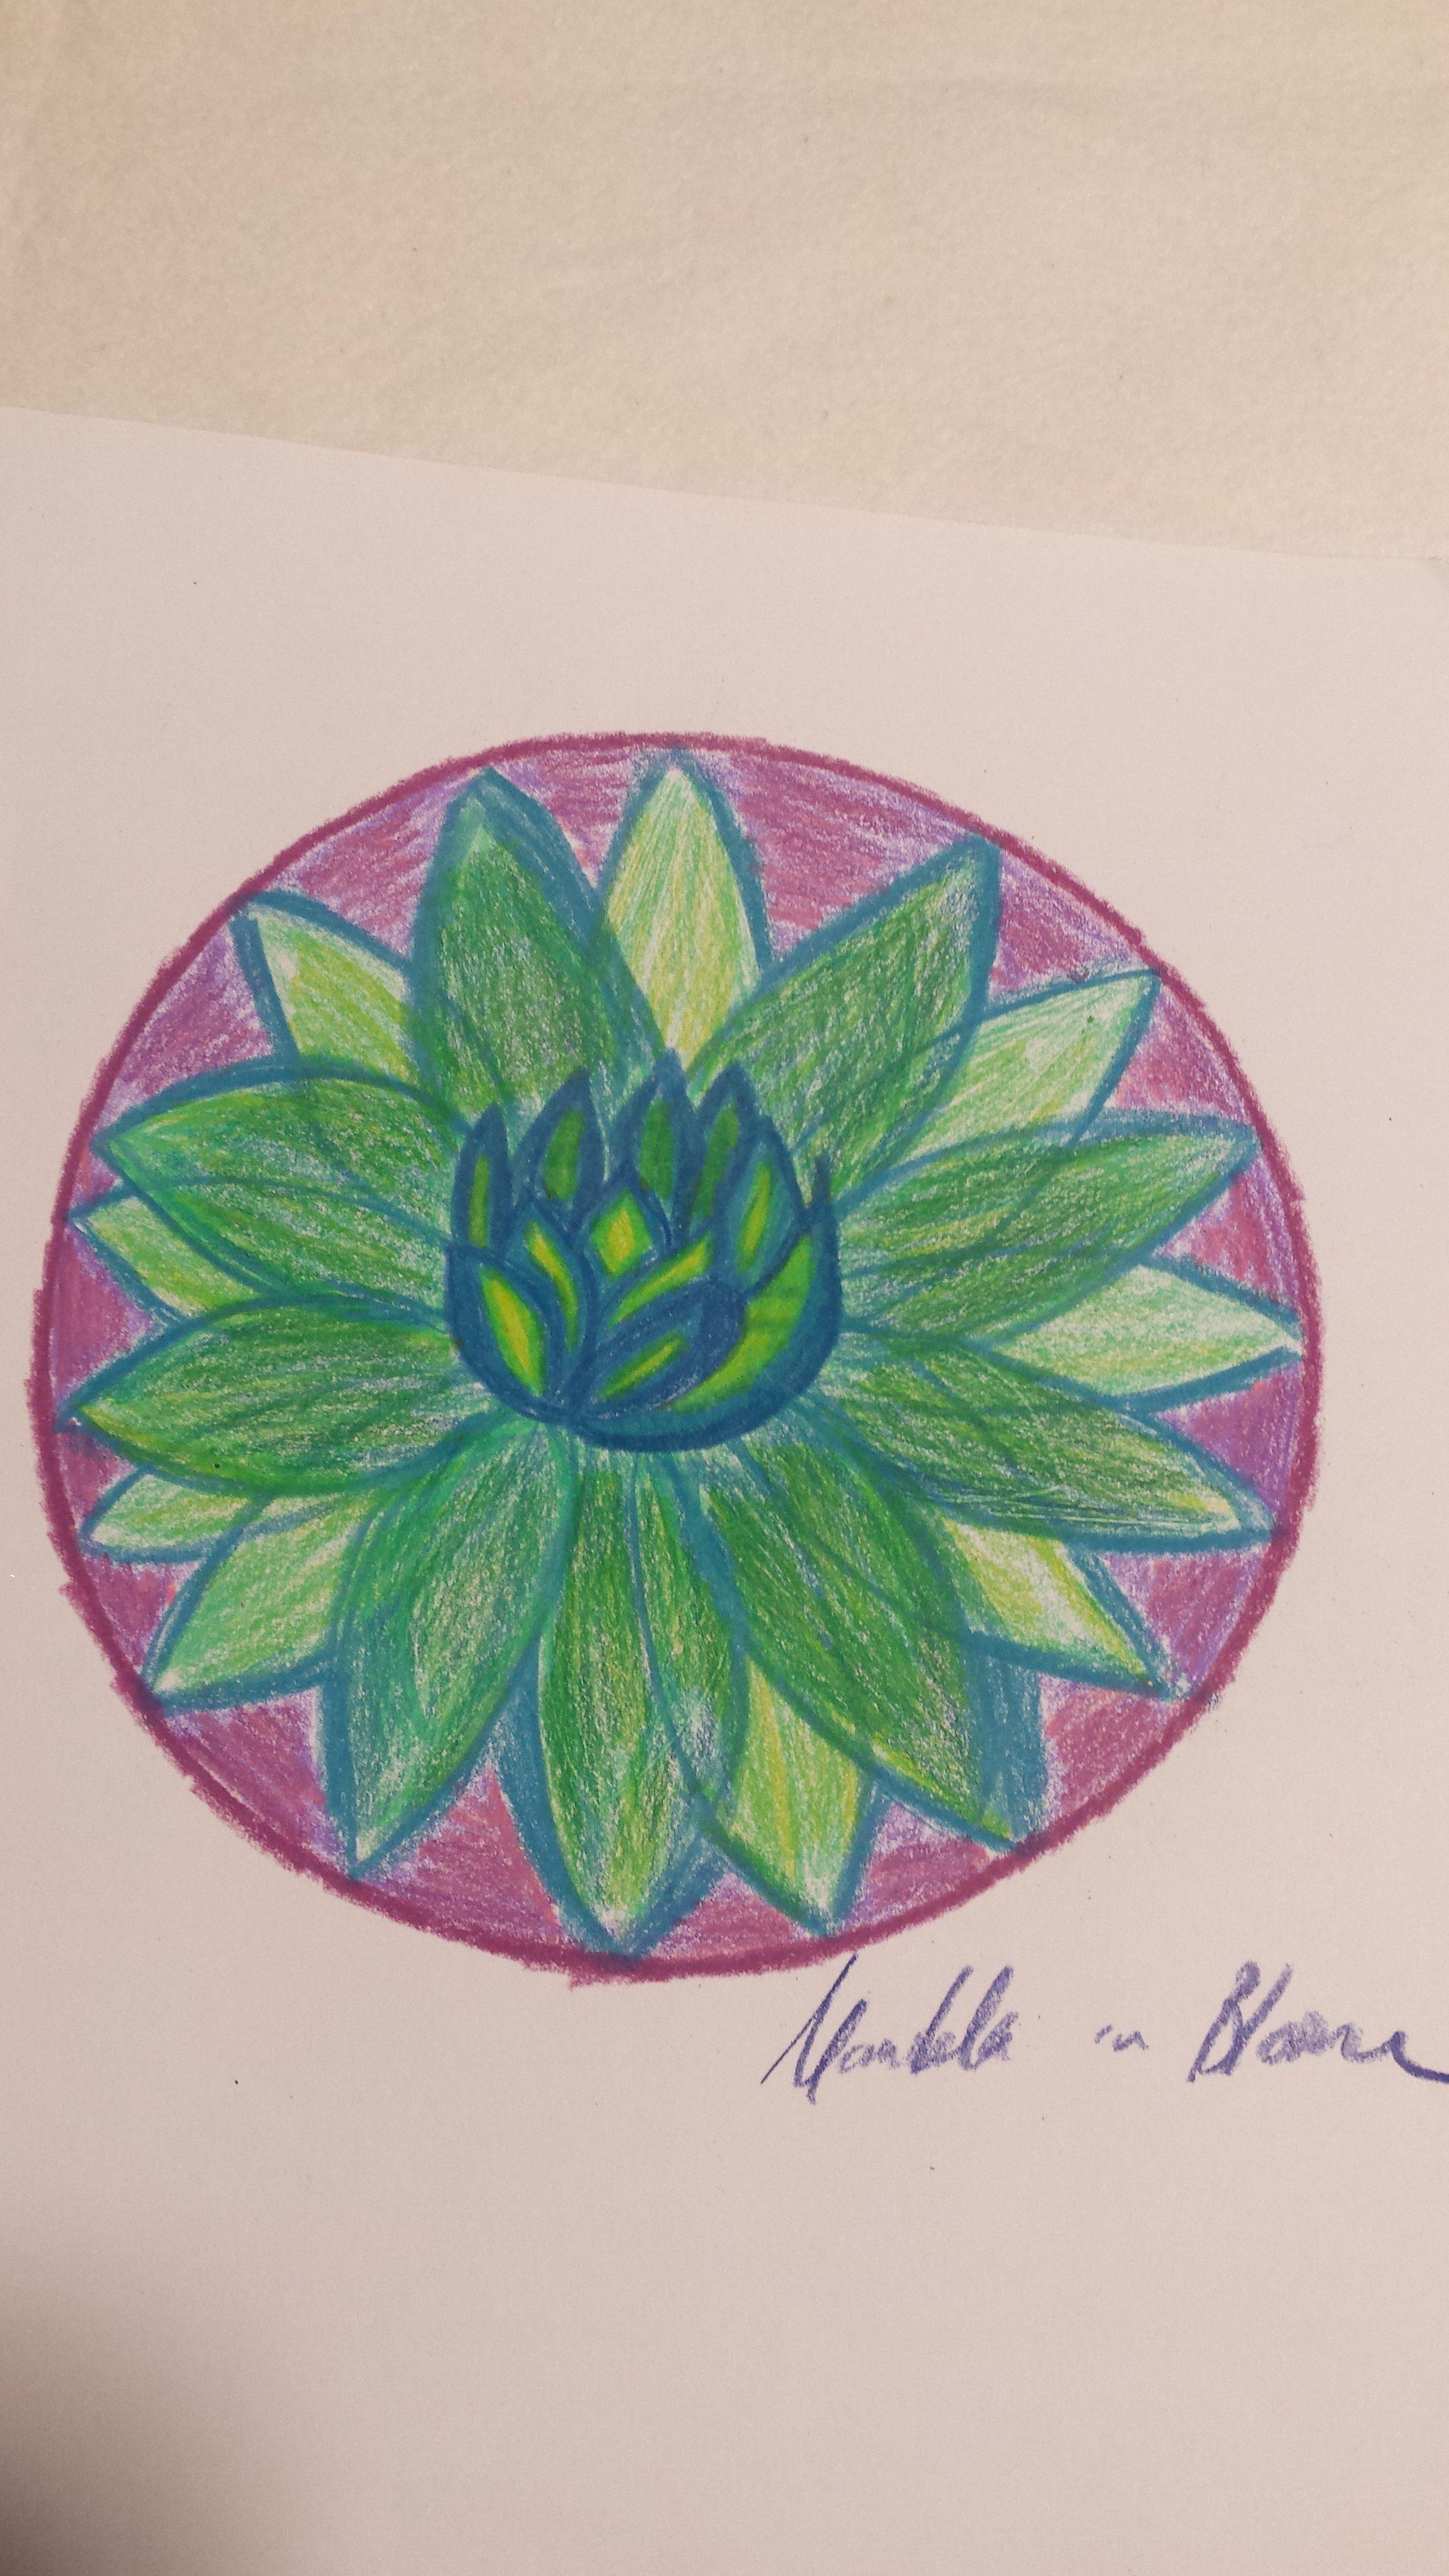 ST2 Mandala in Bloom